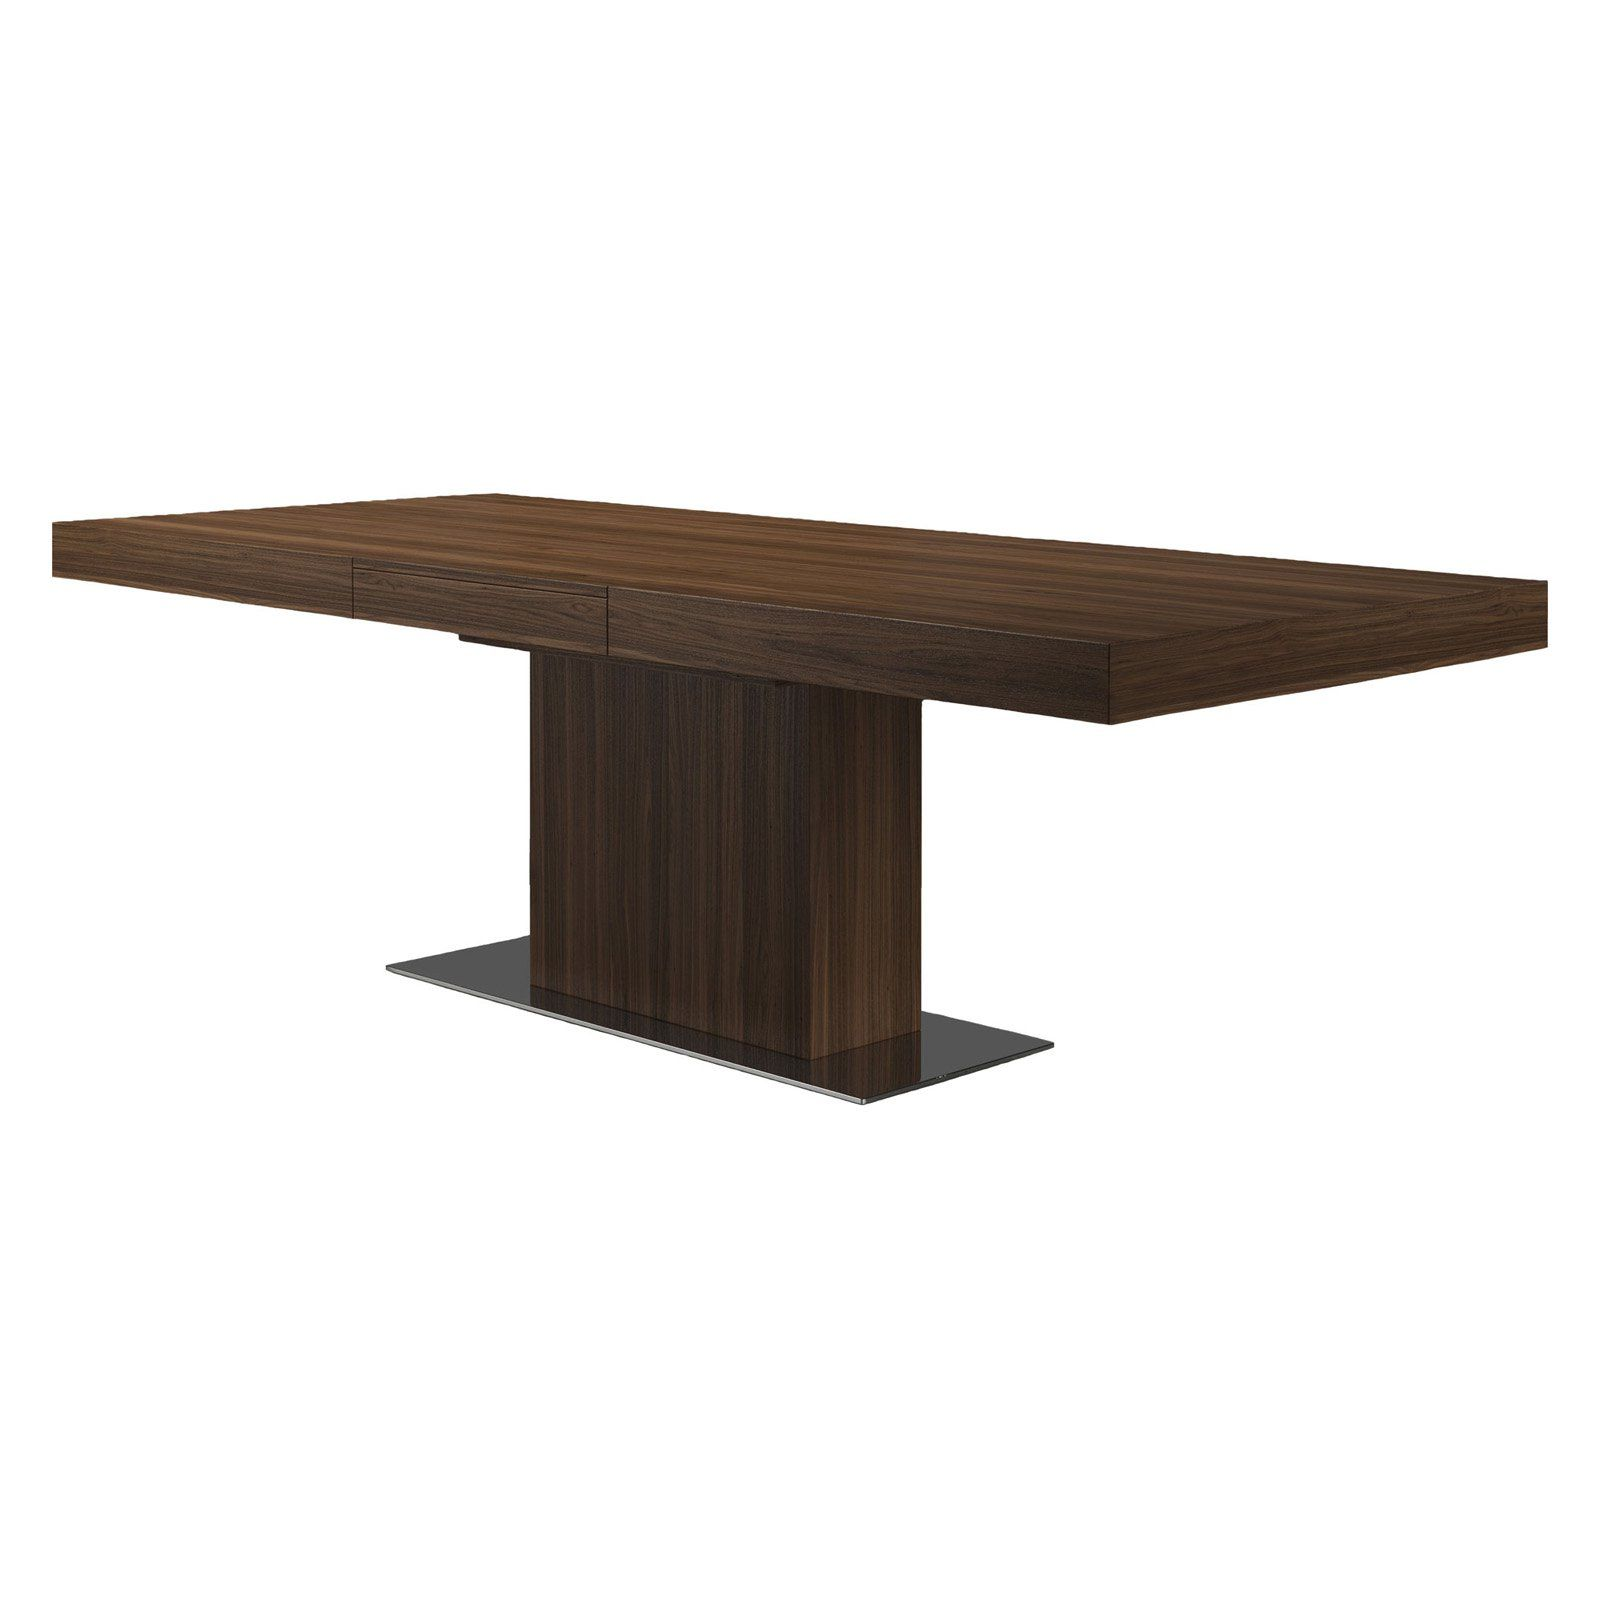 Modloft Astor Rectangle Dining Table Wenge Dining Table